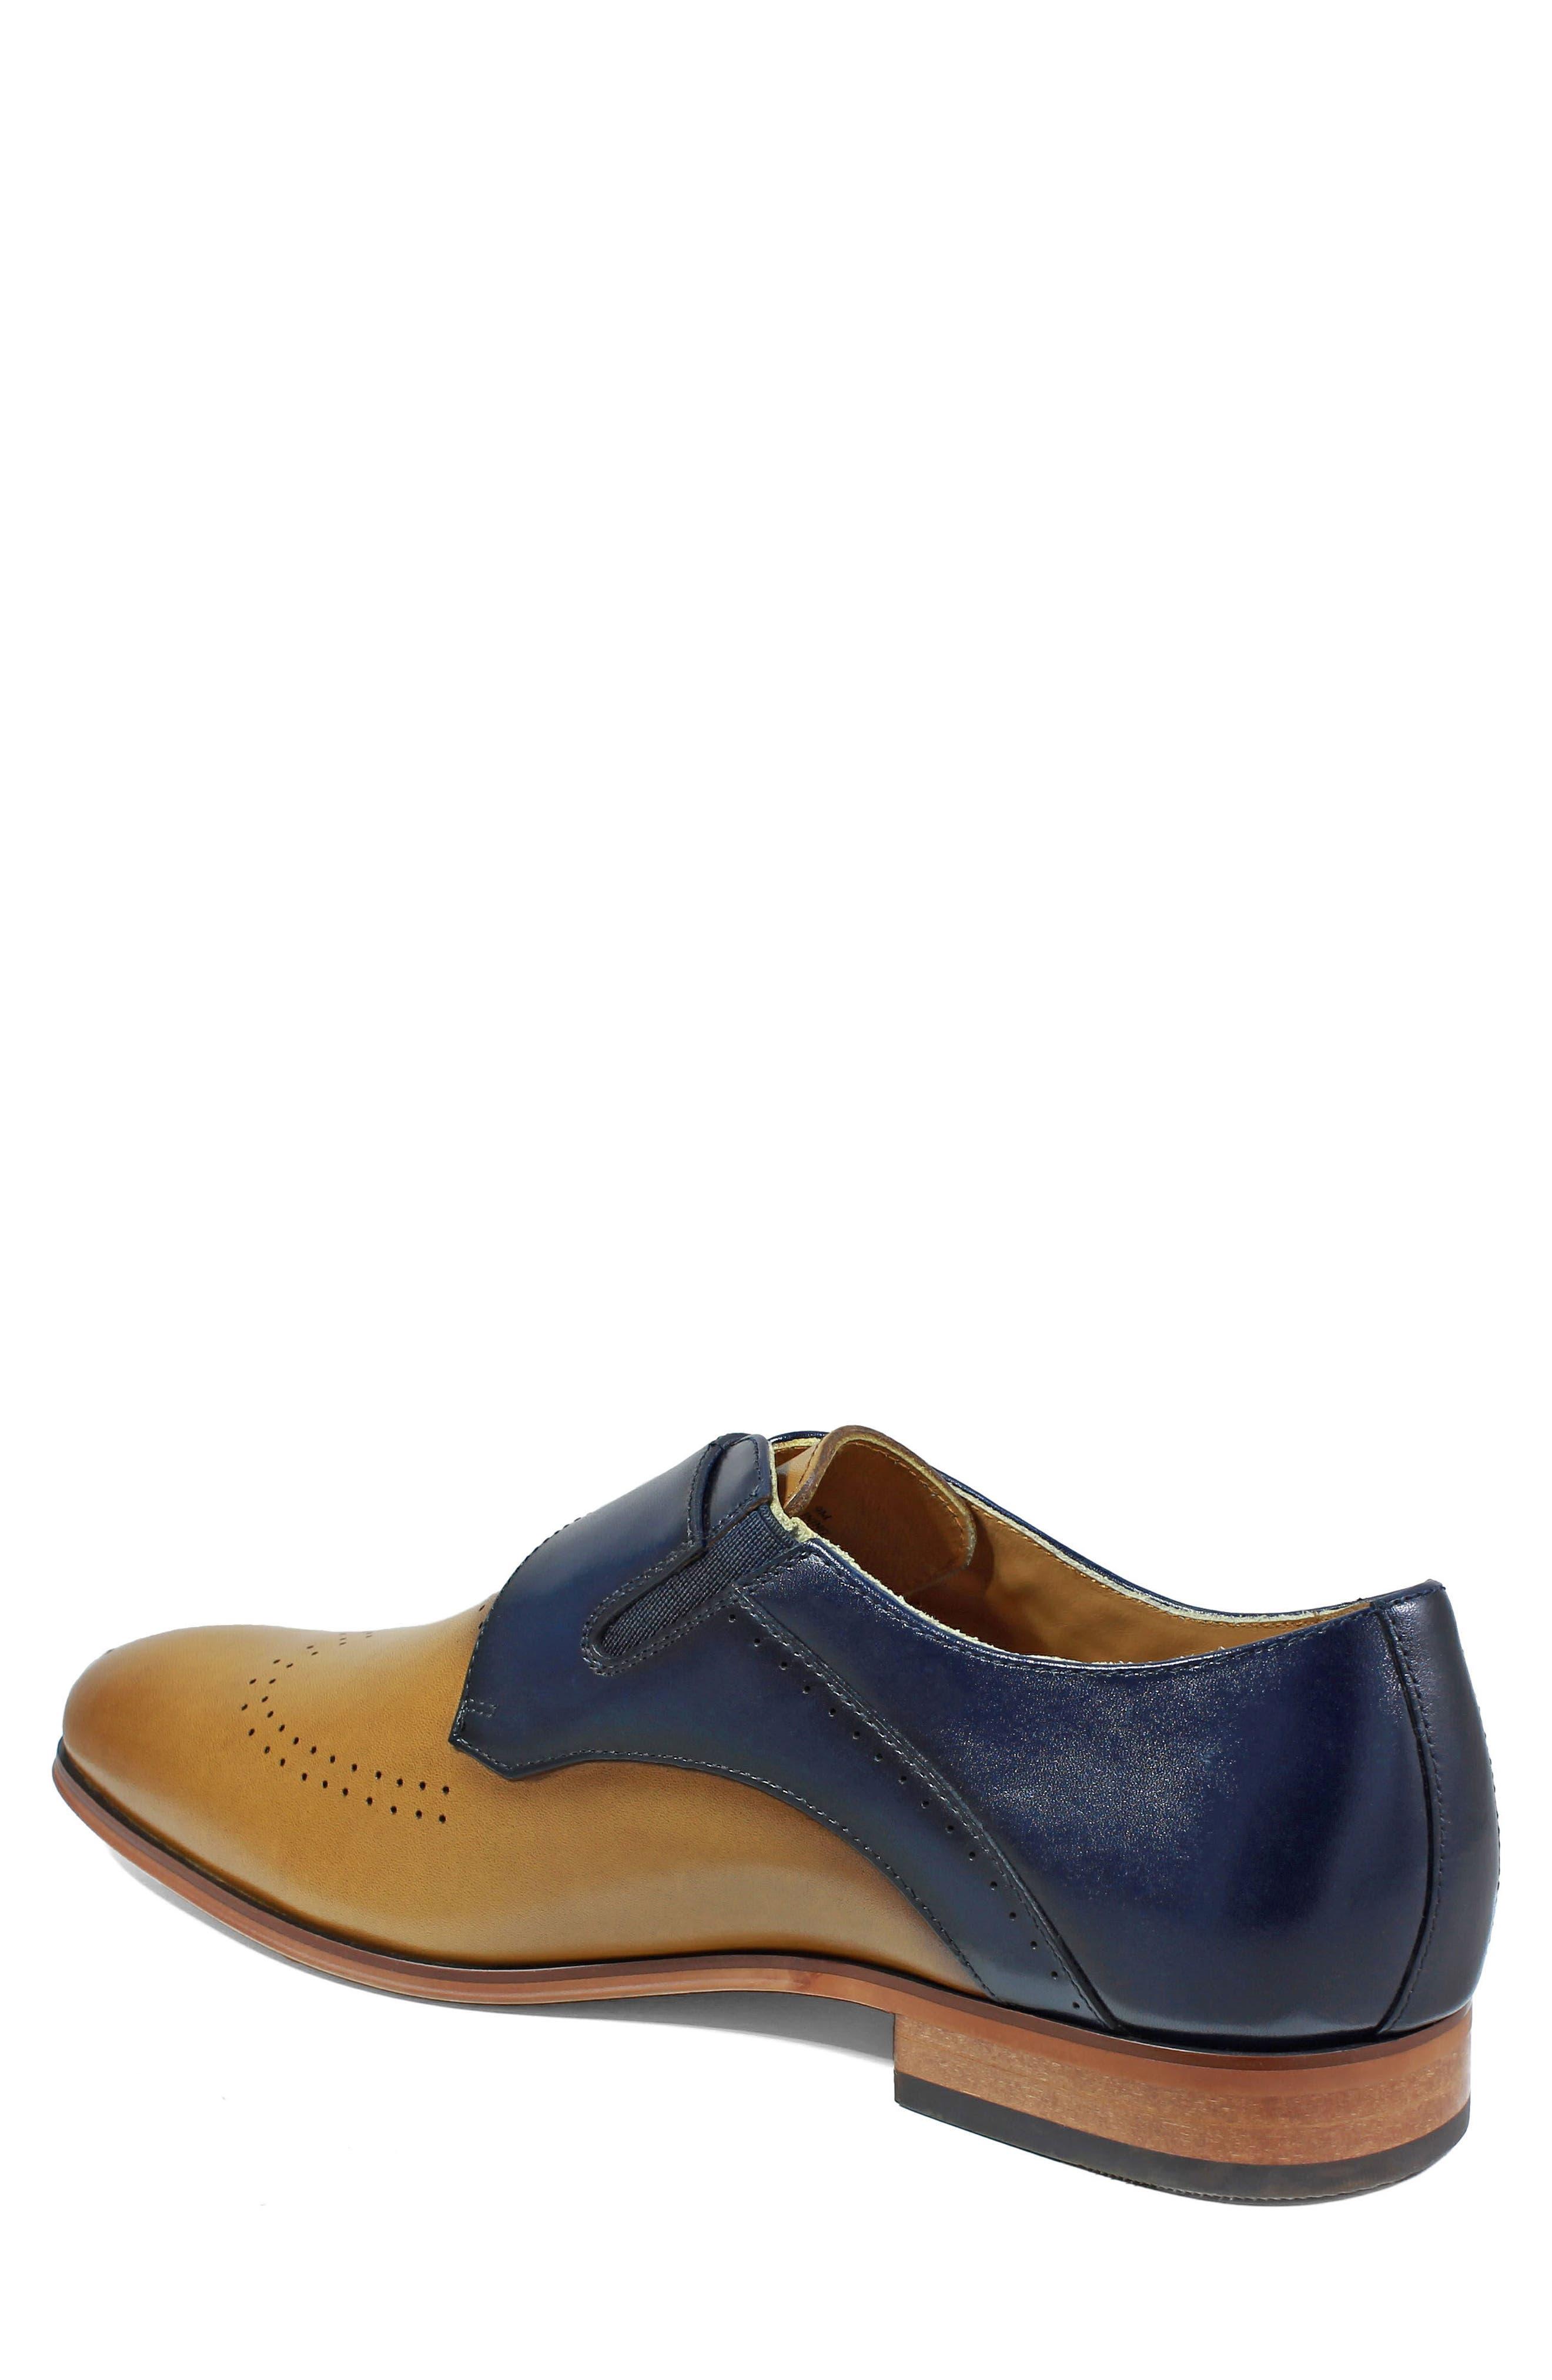 Alternate Image 2  - Stacy Adams Saxon Perforated Monk Shoe (Men)